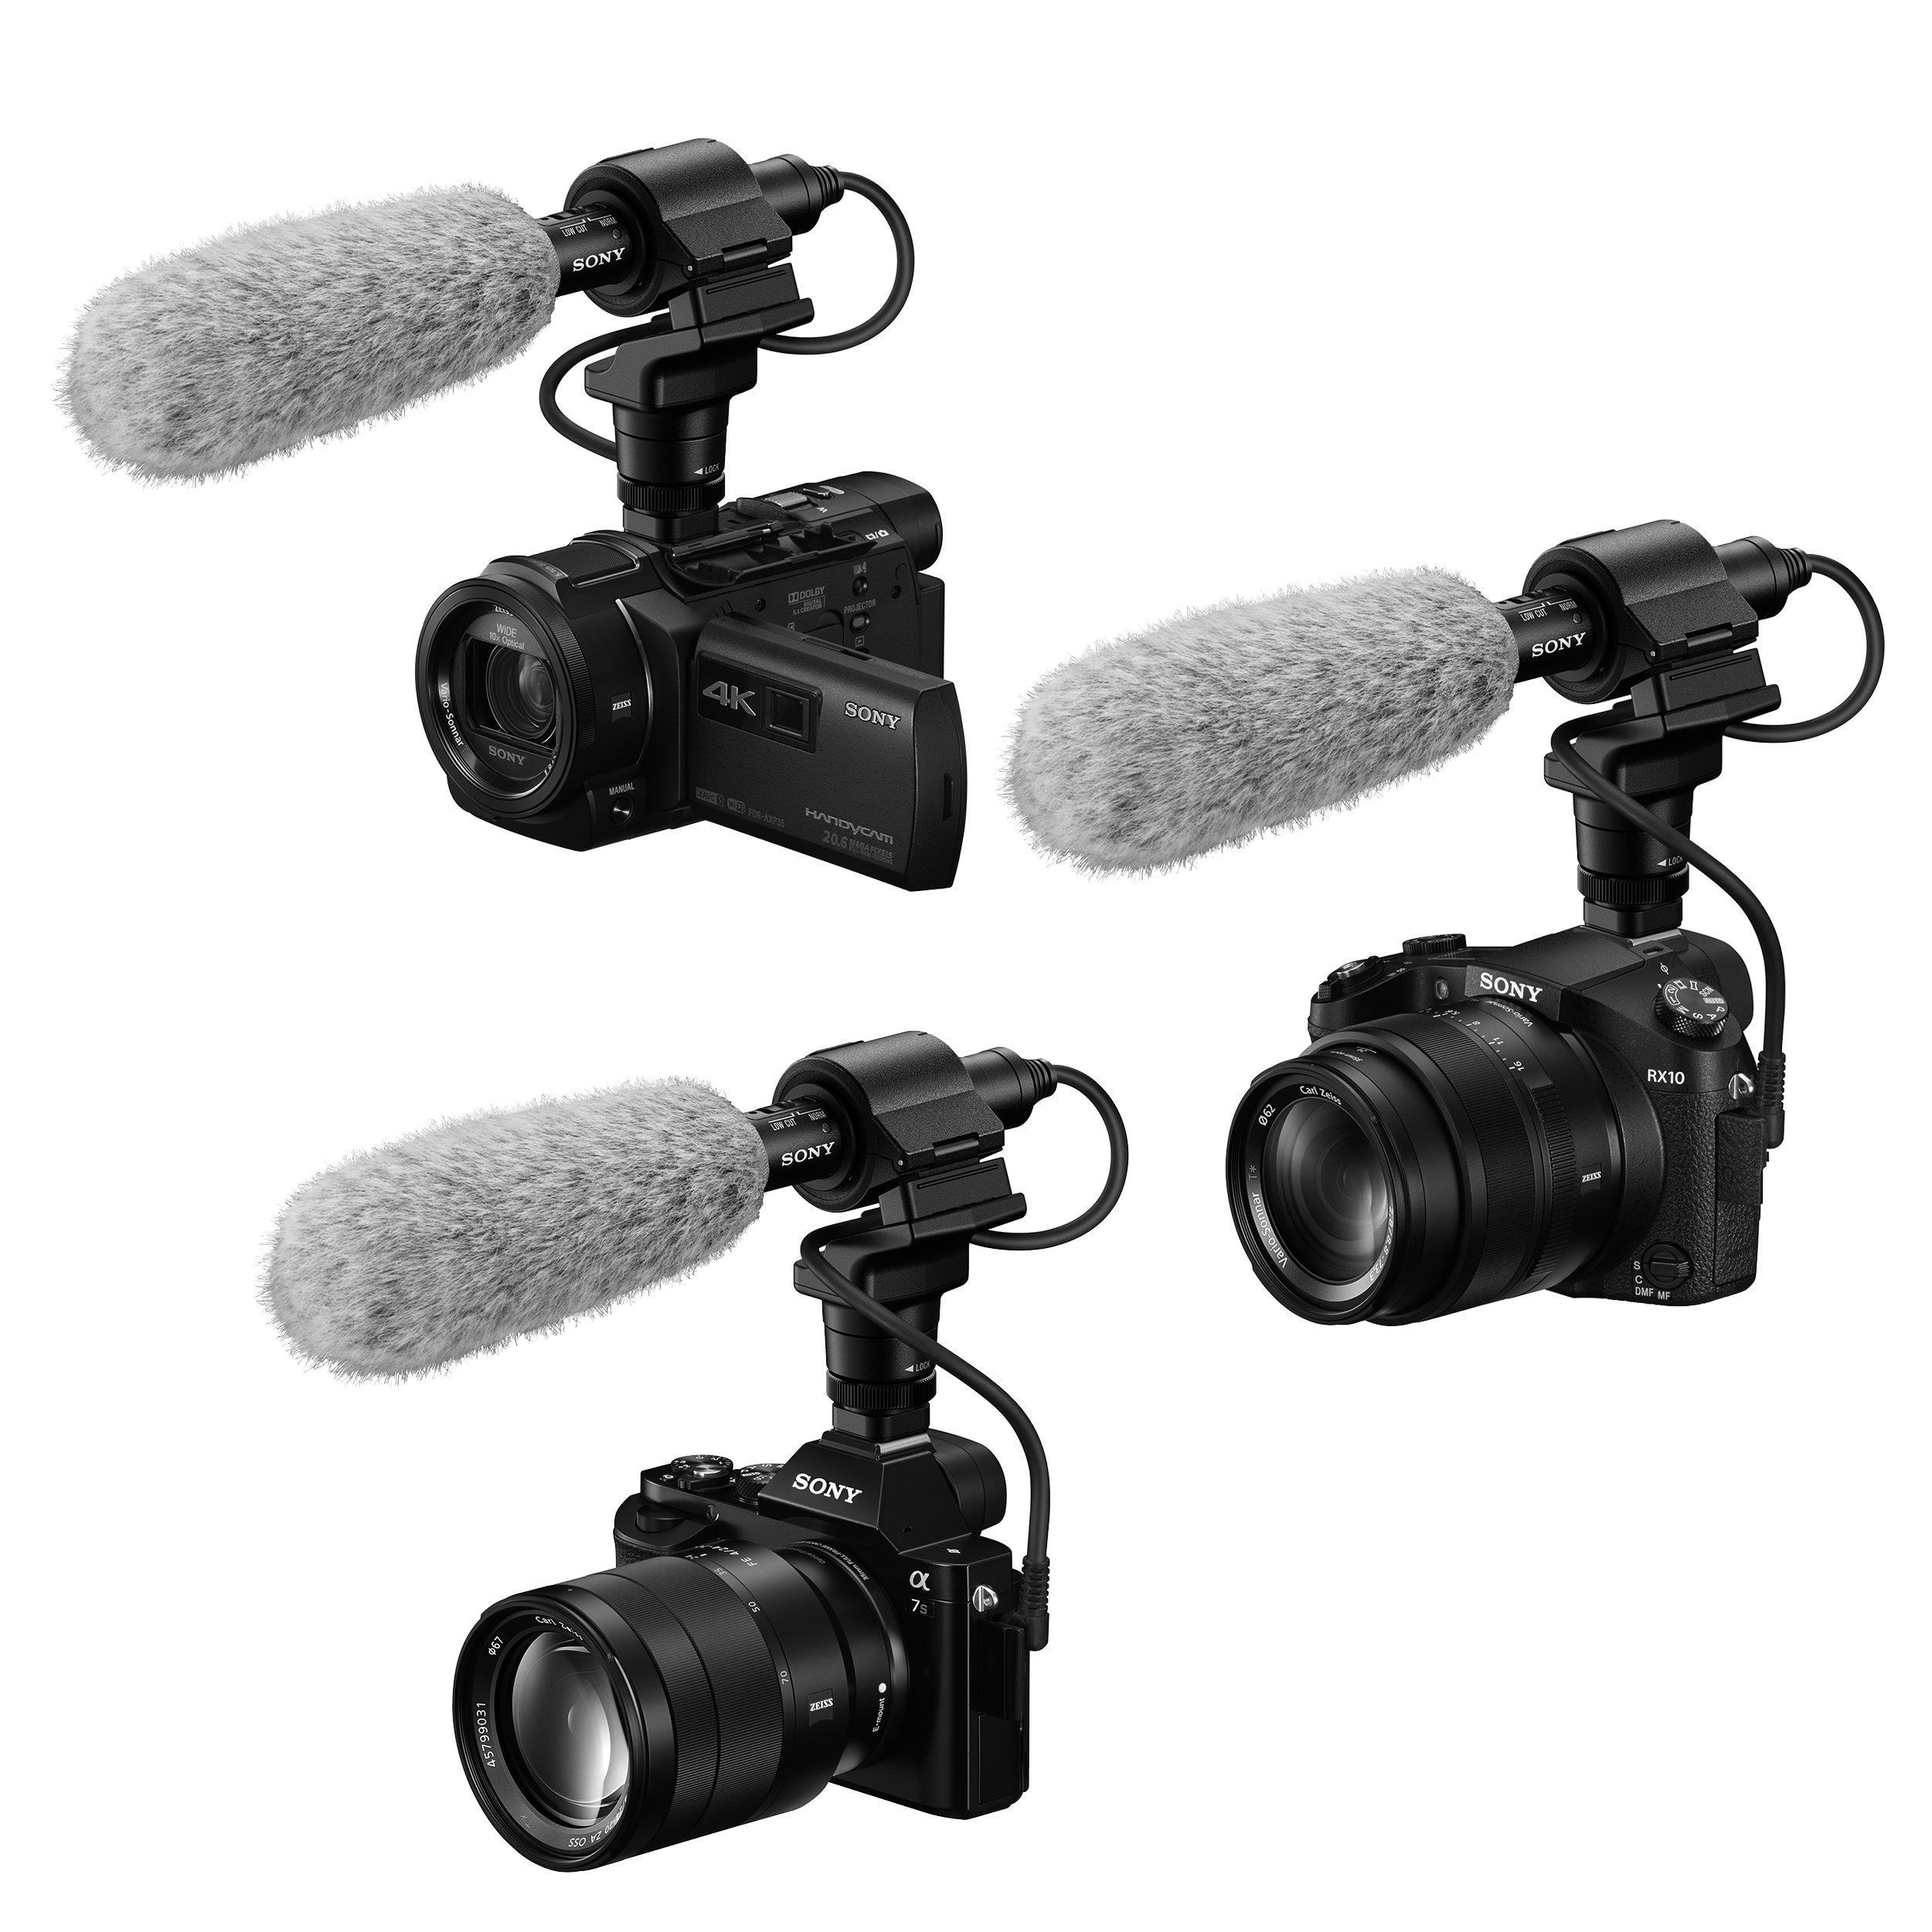 Sony Ecm Cg60 Microphone Ecmcg60 Video Camcorders Hdr Pj810 Handycam Camcorder Pro Quality Performance